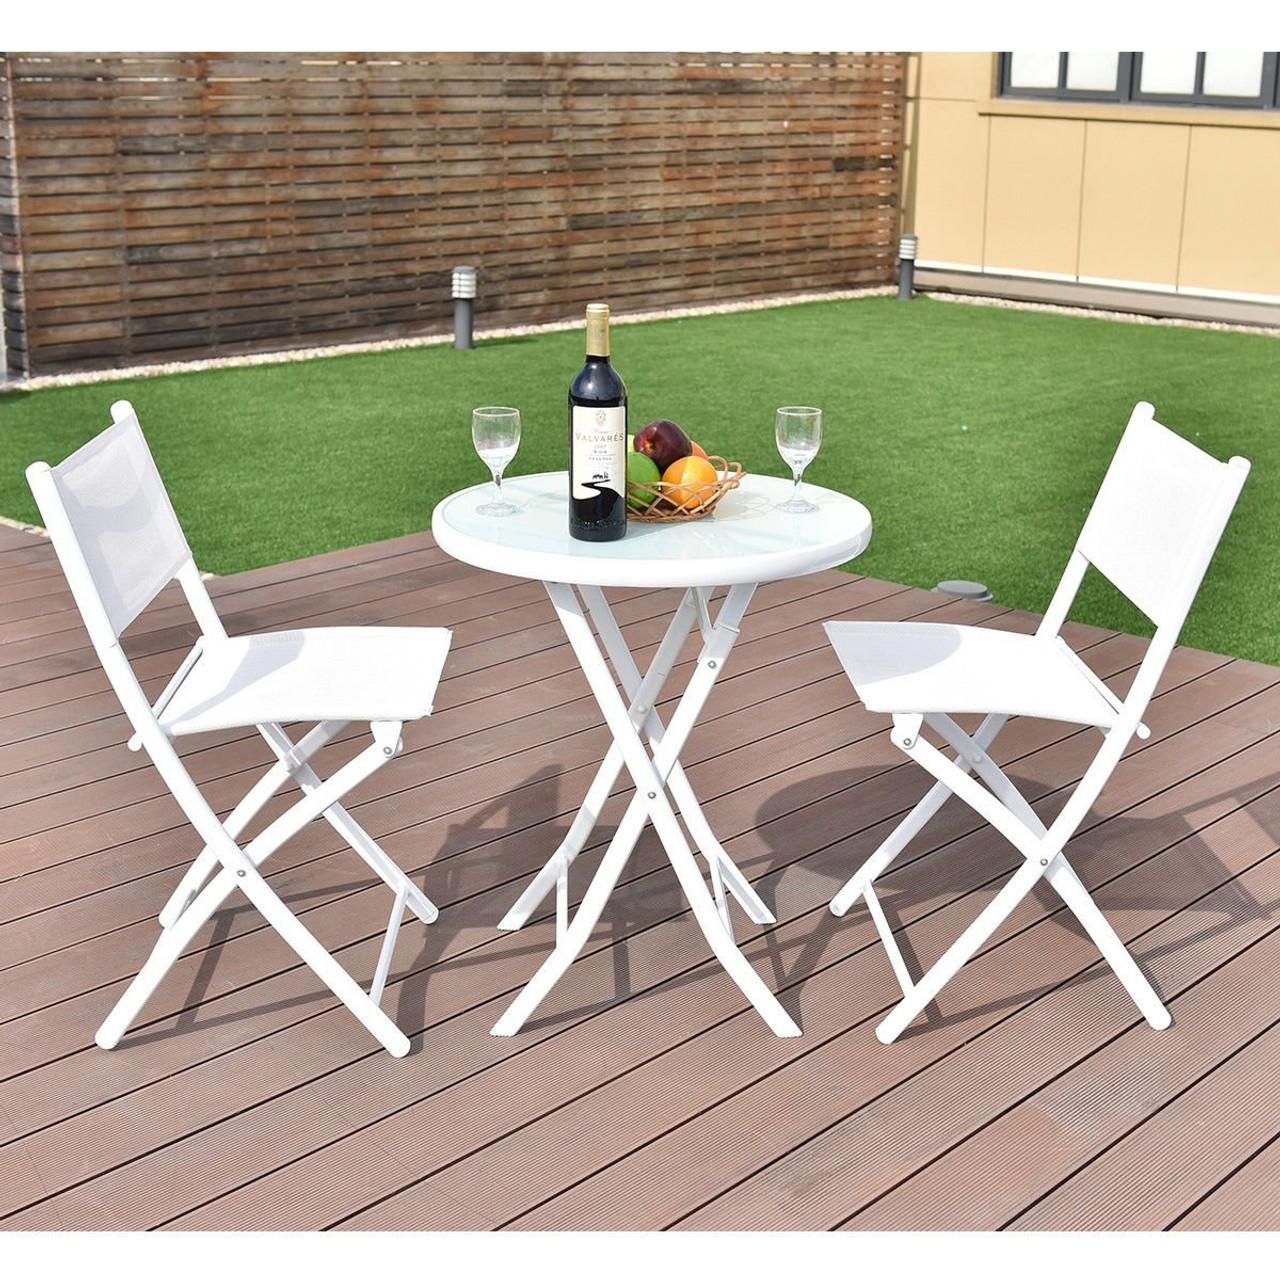 3 pcs folding bistro table chairs set garden backyard patio furniture black new white op3355wh